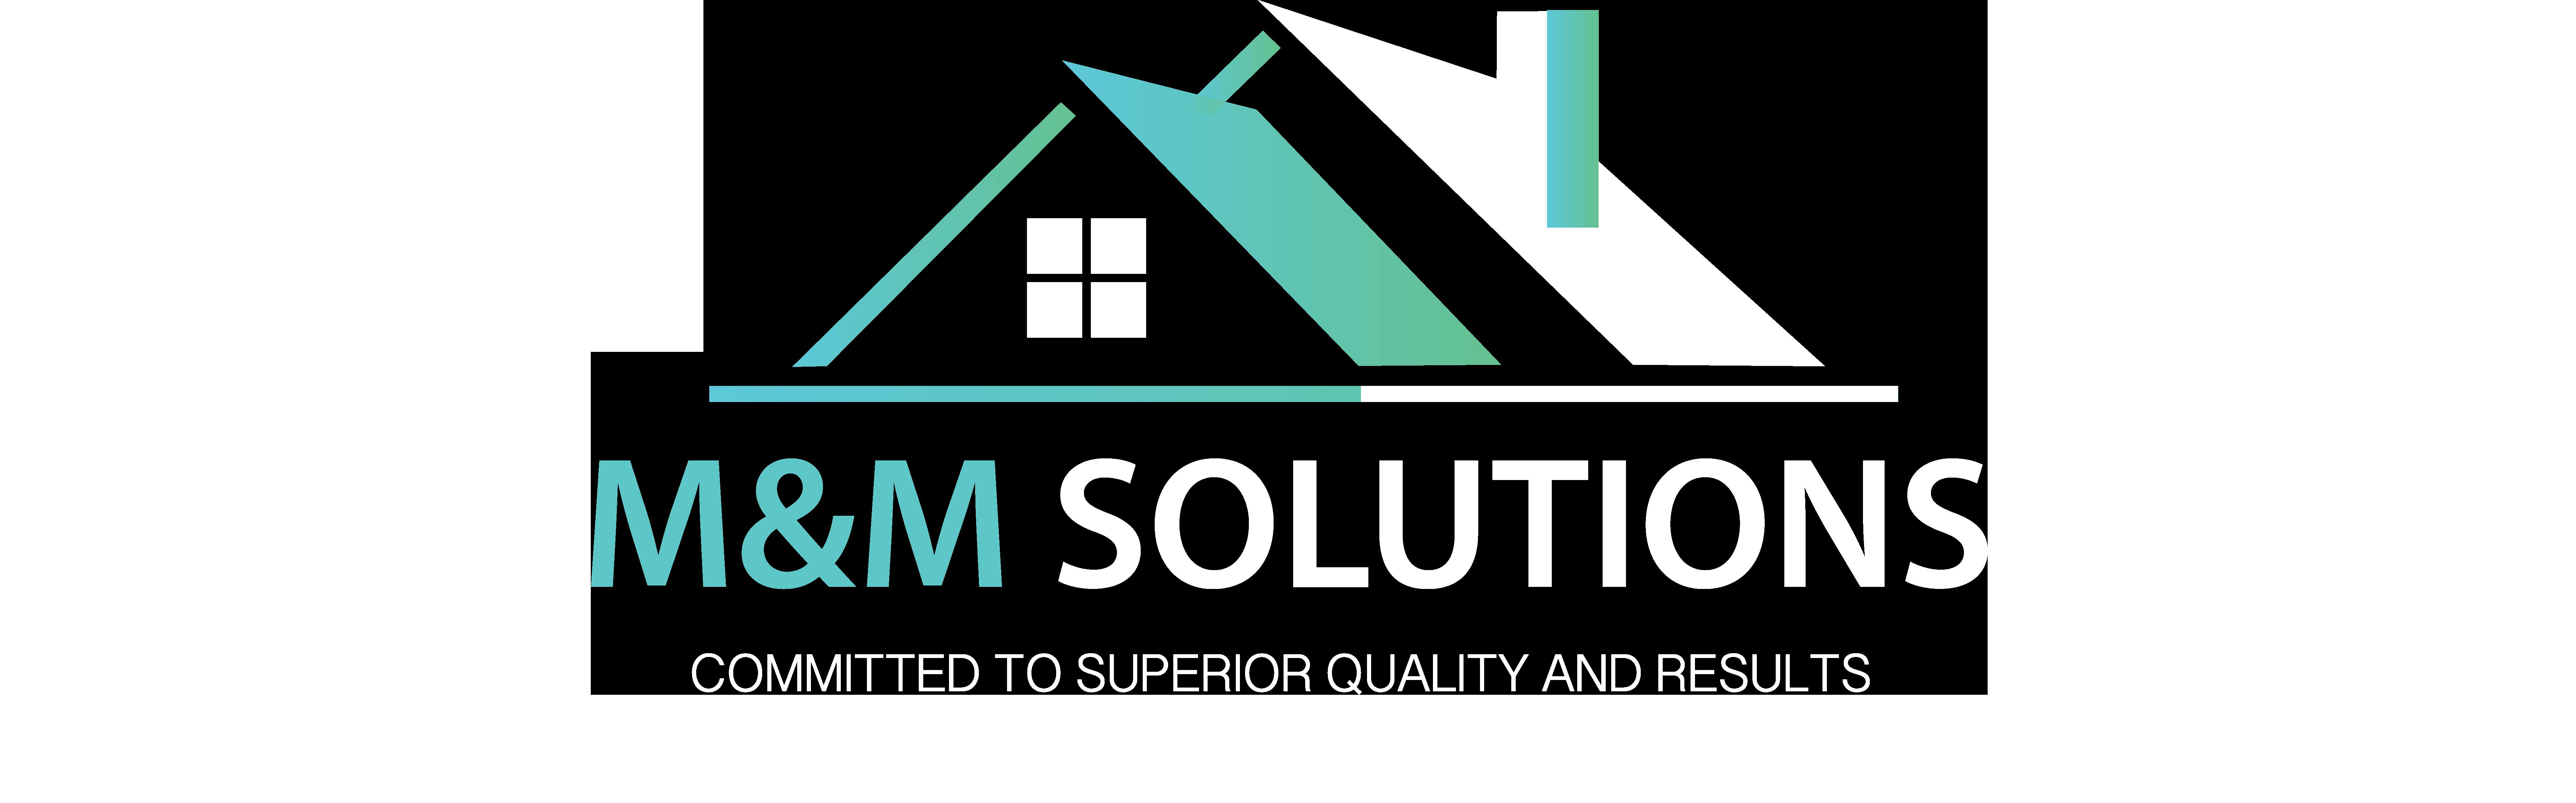 M&M Solutions